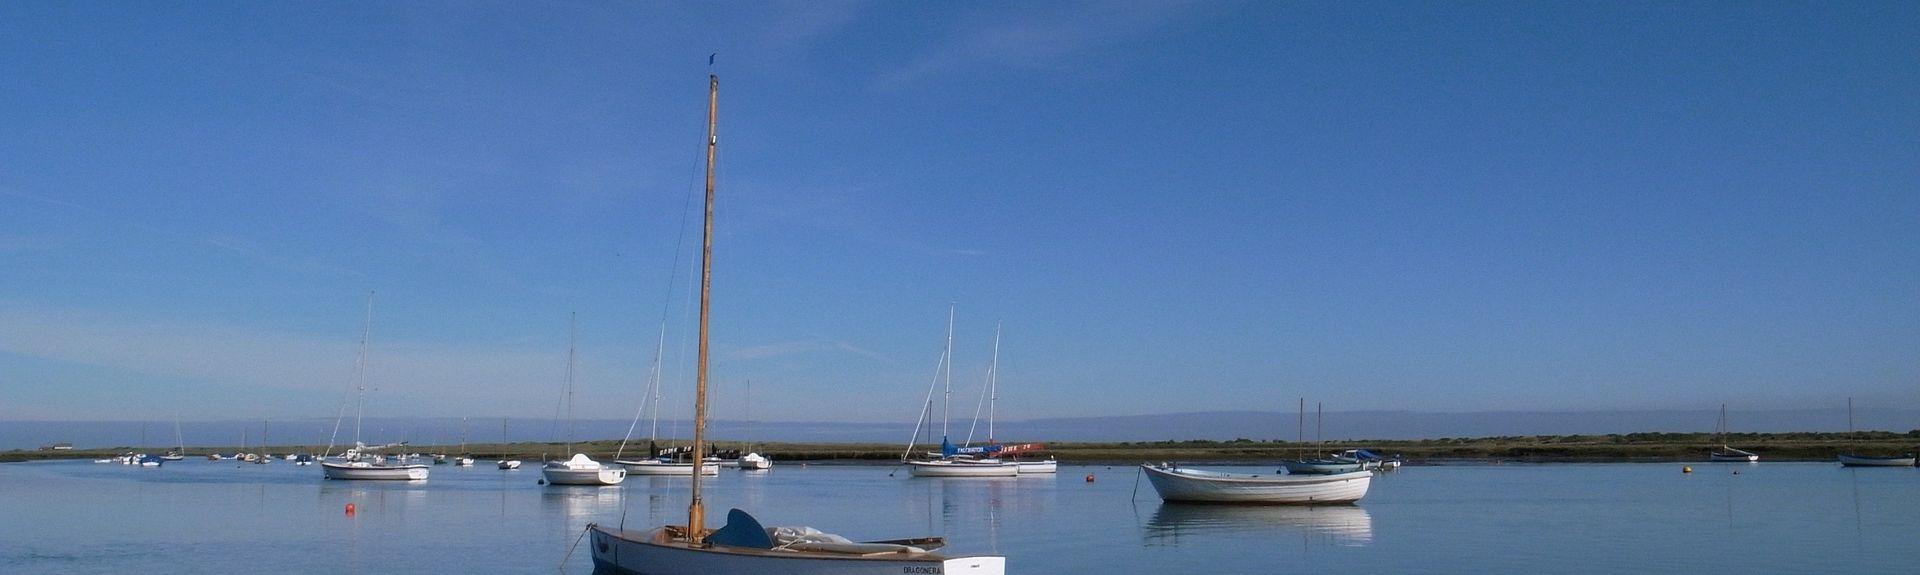 Holme-next-the-Sea, Hunstanton, Norfolk, UK